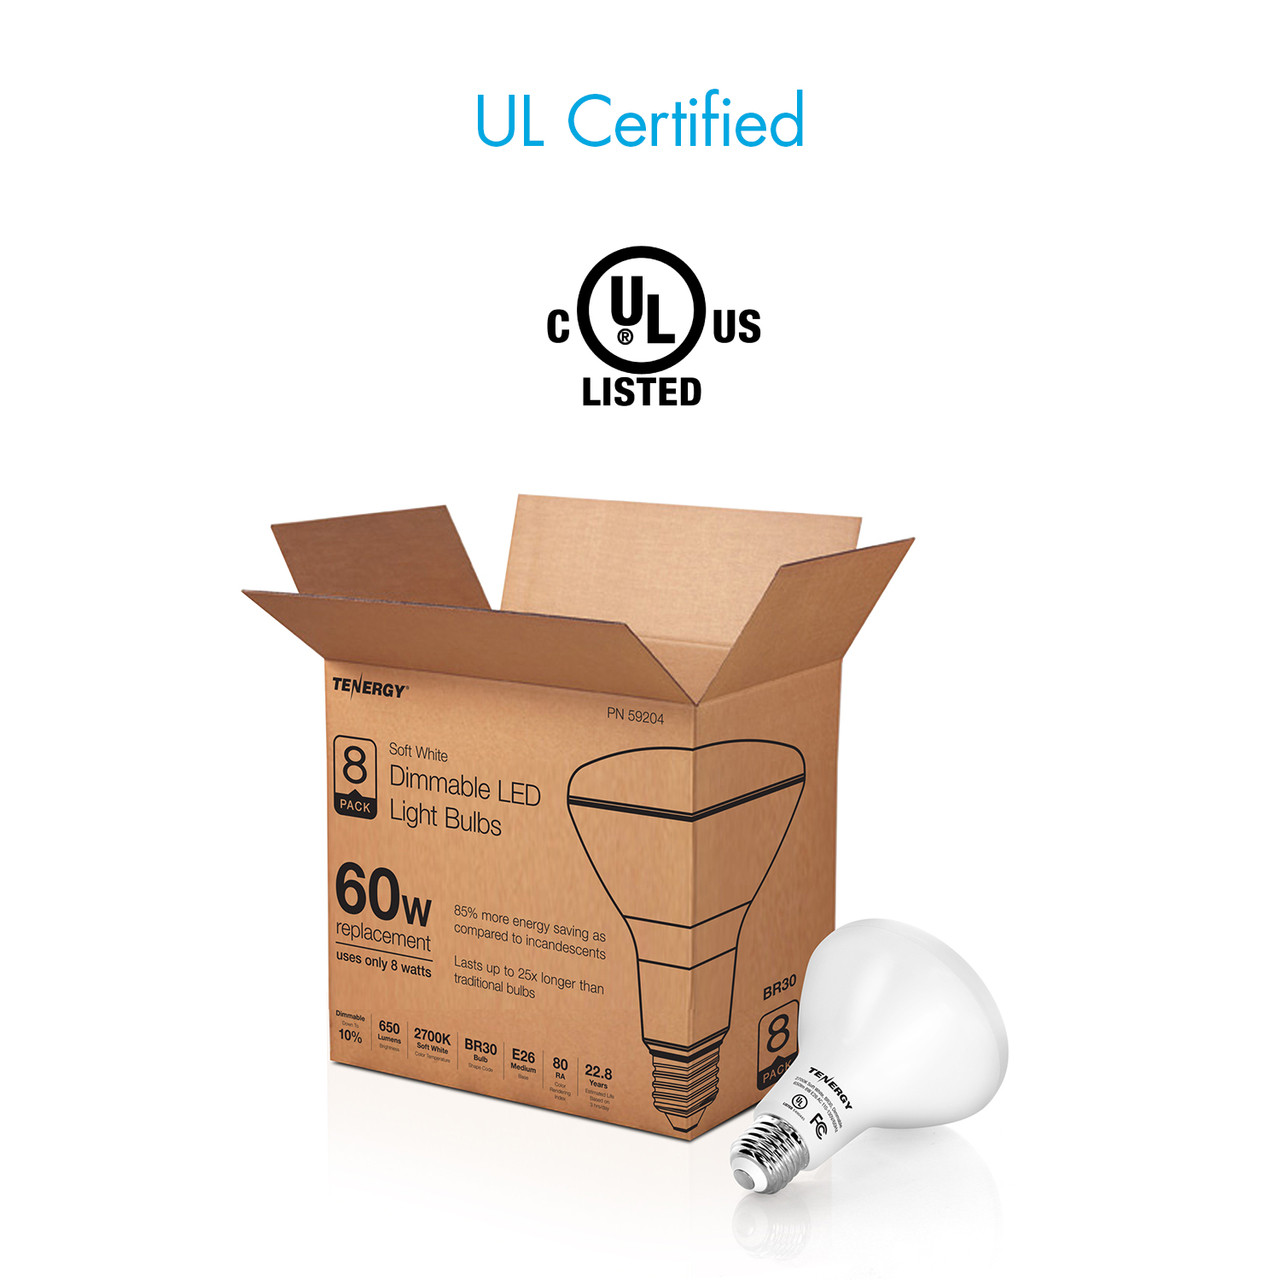 8W Dimmable LED Flood Light 2700K (Soft White)